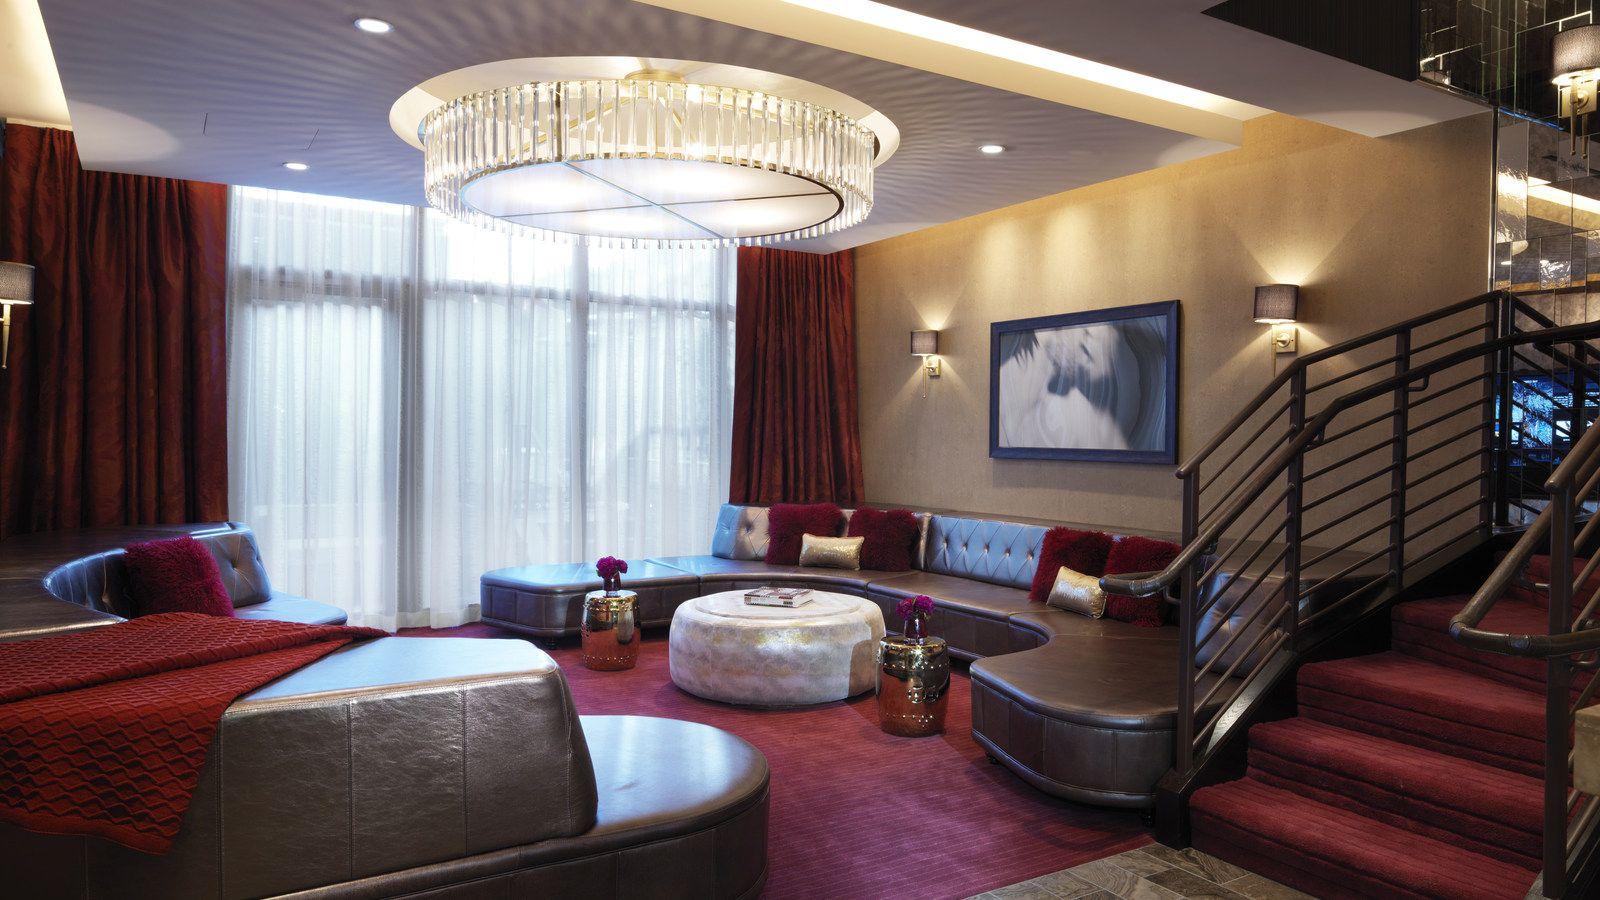 Las Vegas Bungalows Vegas Suites Hotel Interiors Las Vegas Suites